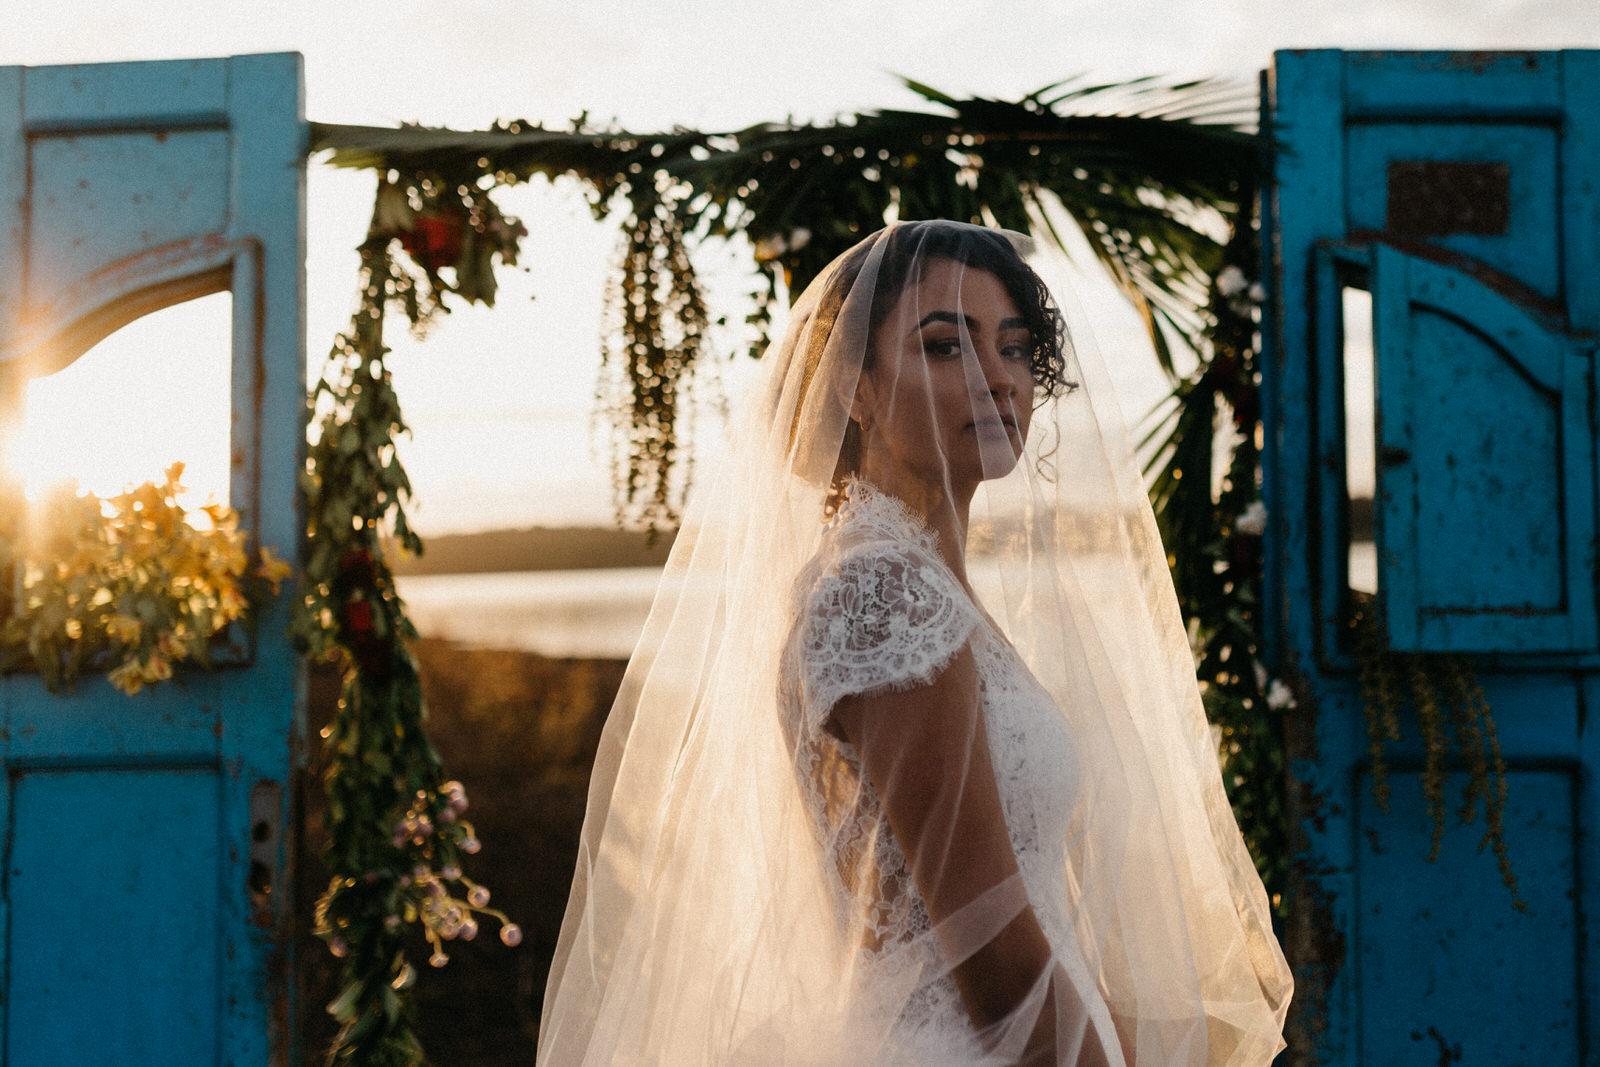 Céu_fotografia_casamentos_goiás_brasil_folk_noivas_brides_alternativo (56).jpg